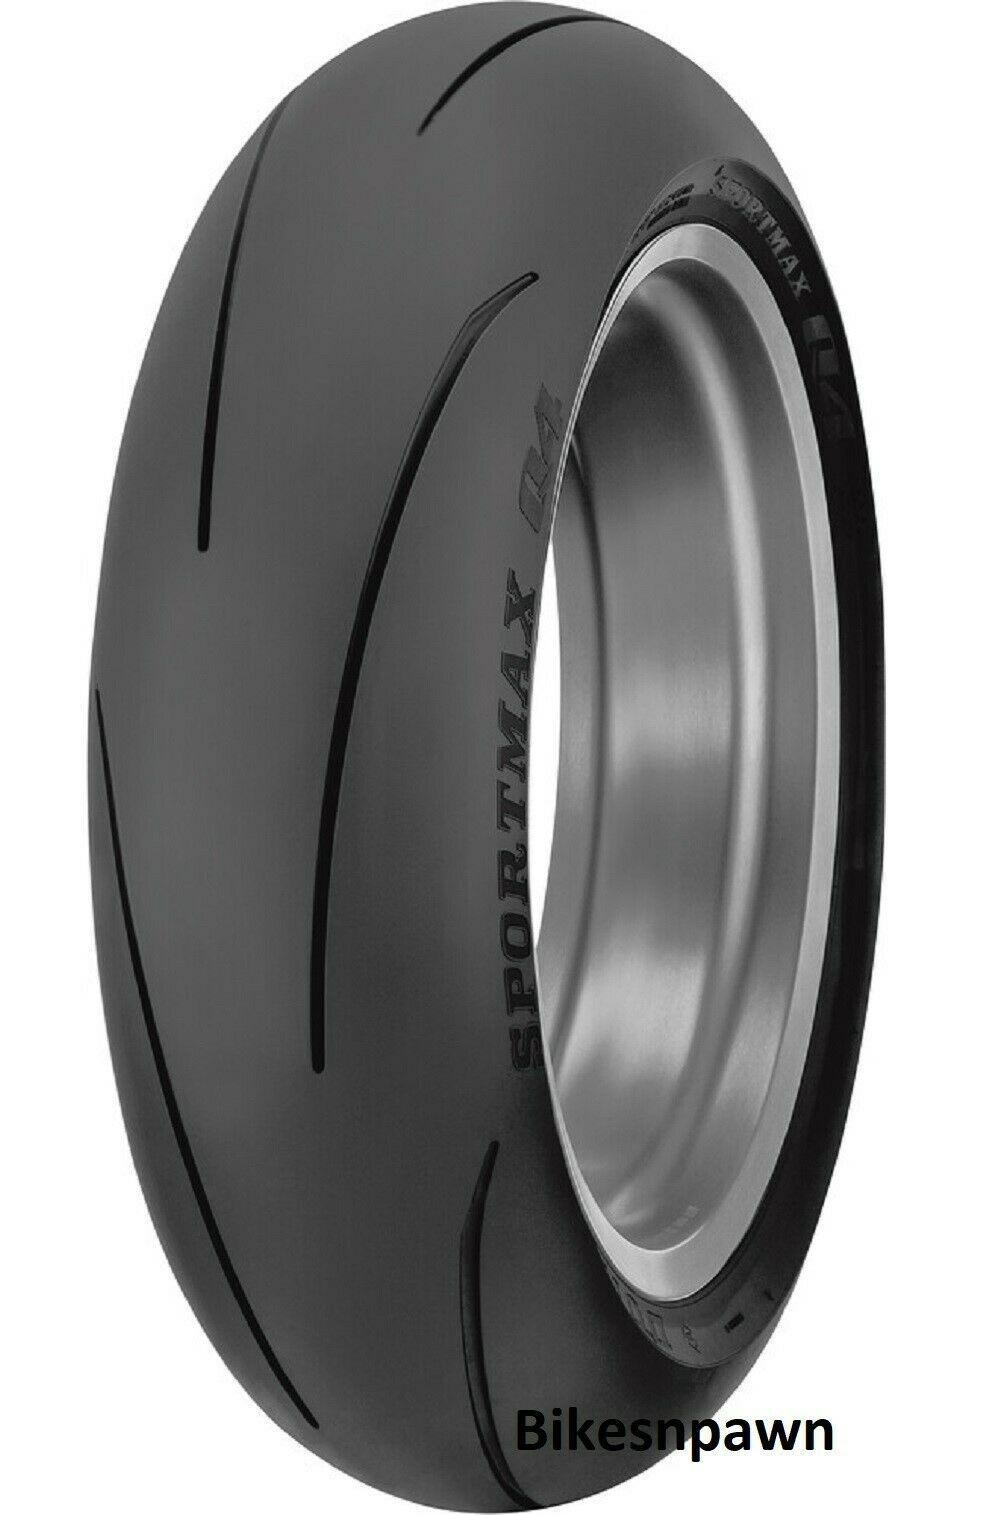 New 200/55ZR17 Dunlop Q4 Sportmax Rear Radial Motorcycle Tire 78W TL